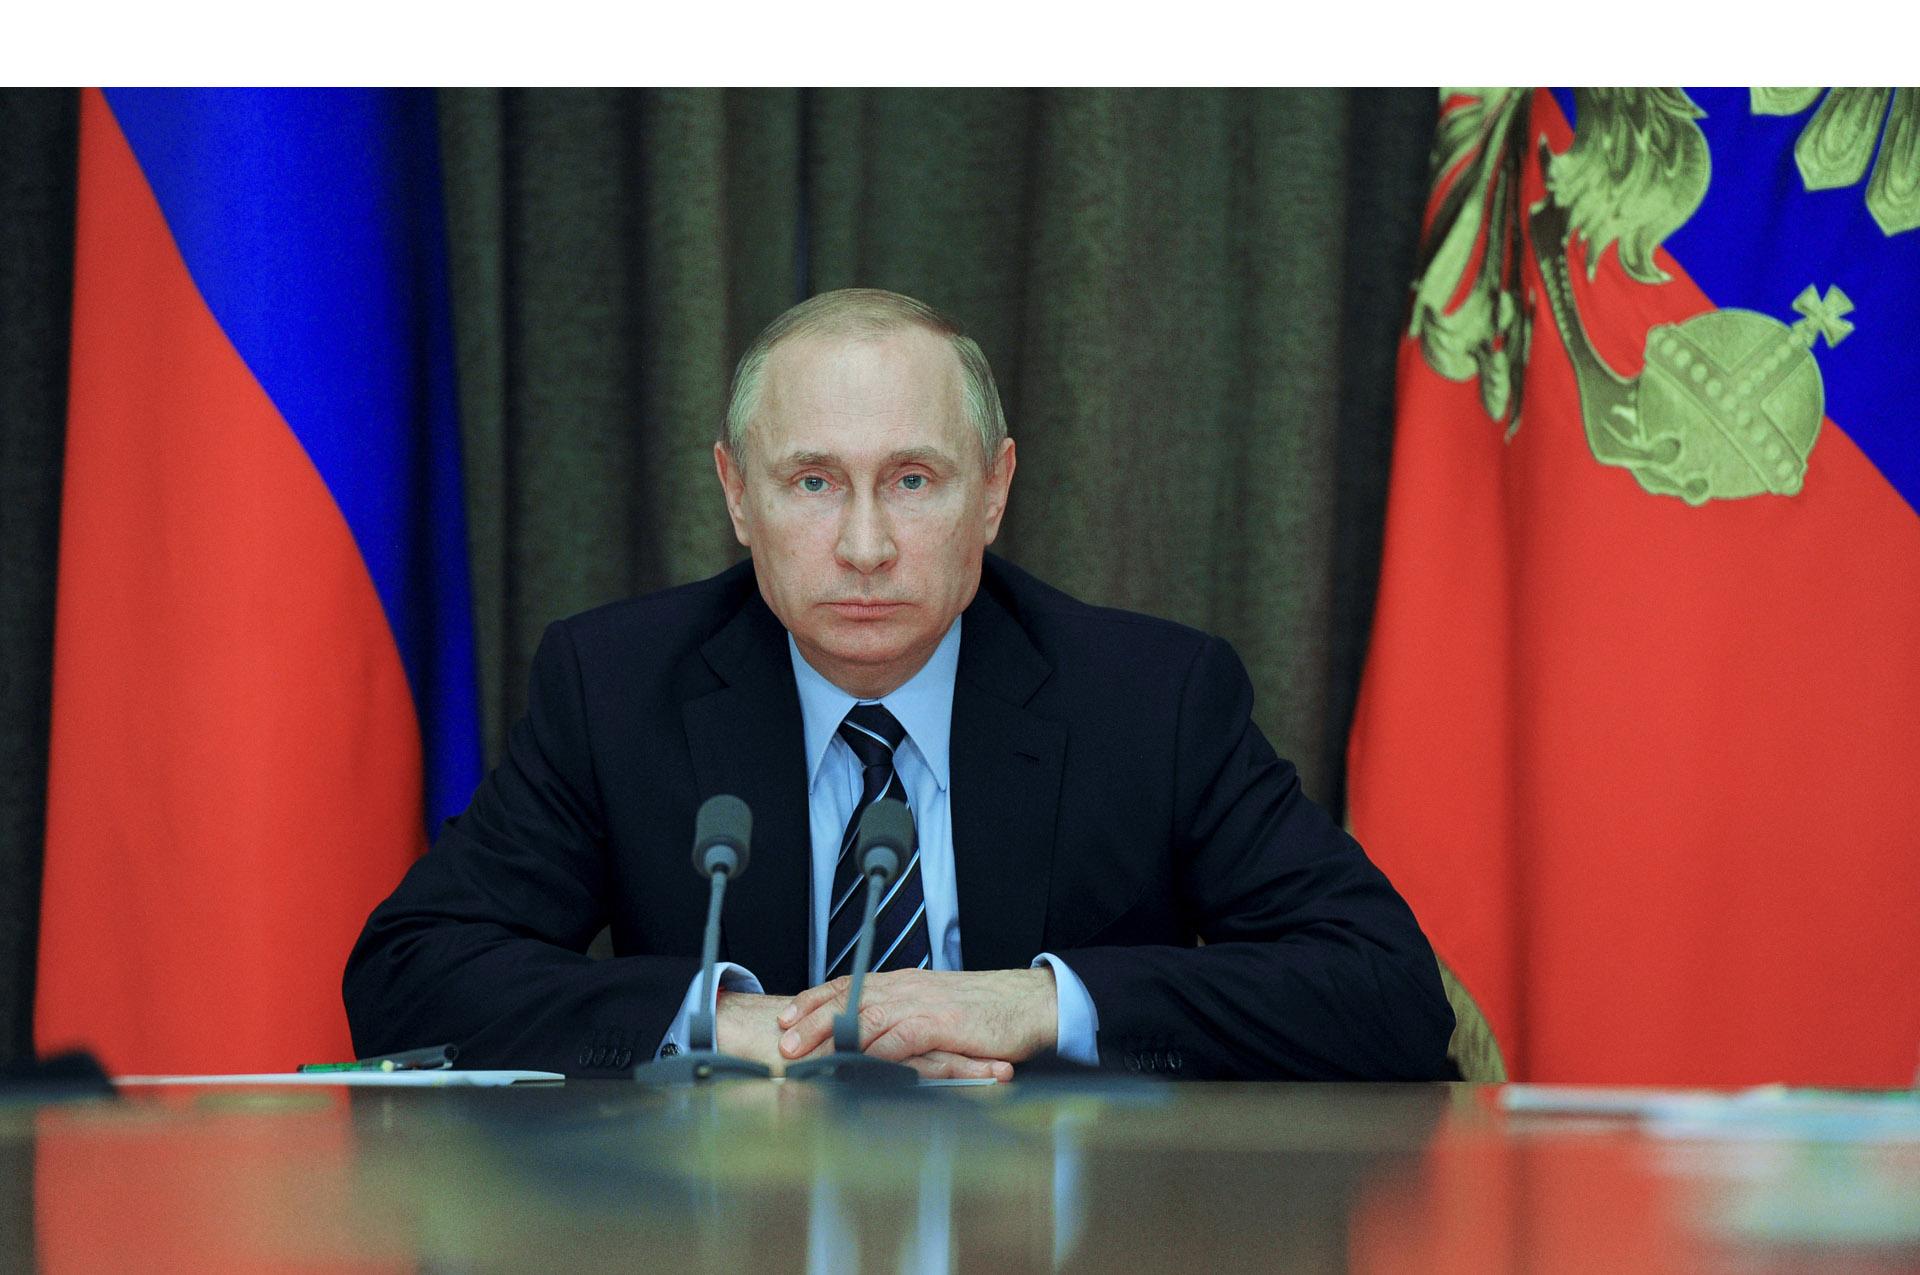 OTAN quiere dialogar con Rusia